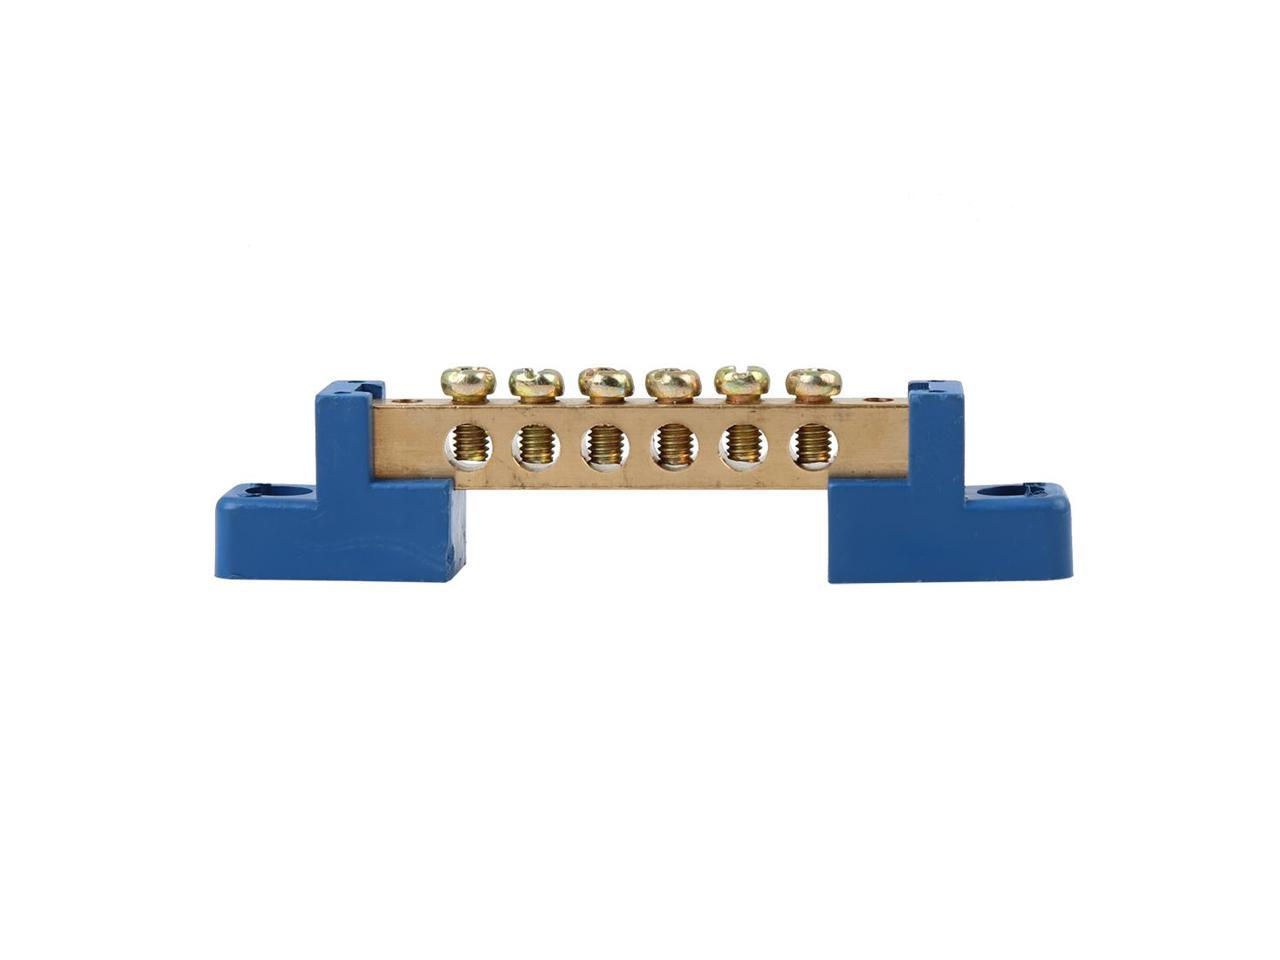 X AUTOHAUX 6 Positions Screw Metal Terminal Grounding Strip Bus Bar Block DC250V 110A